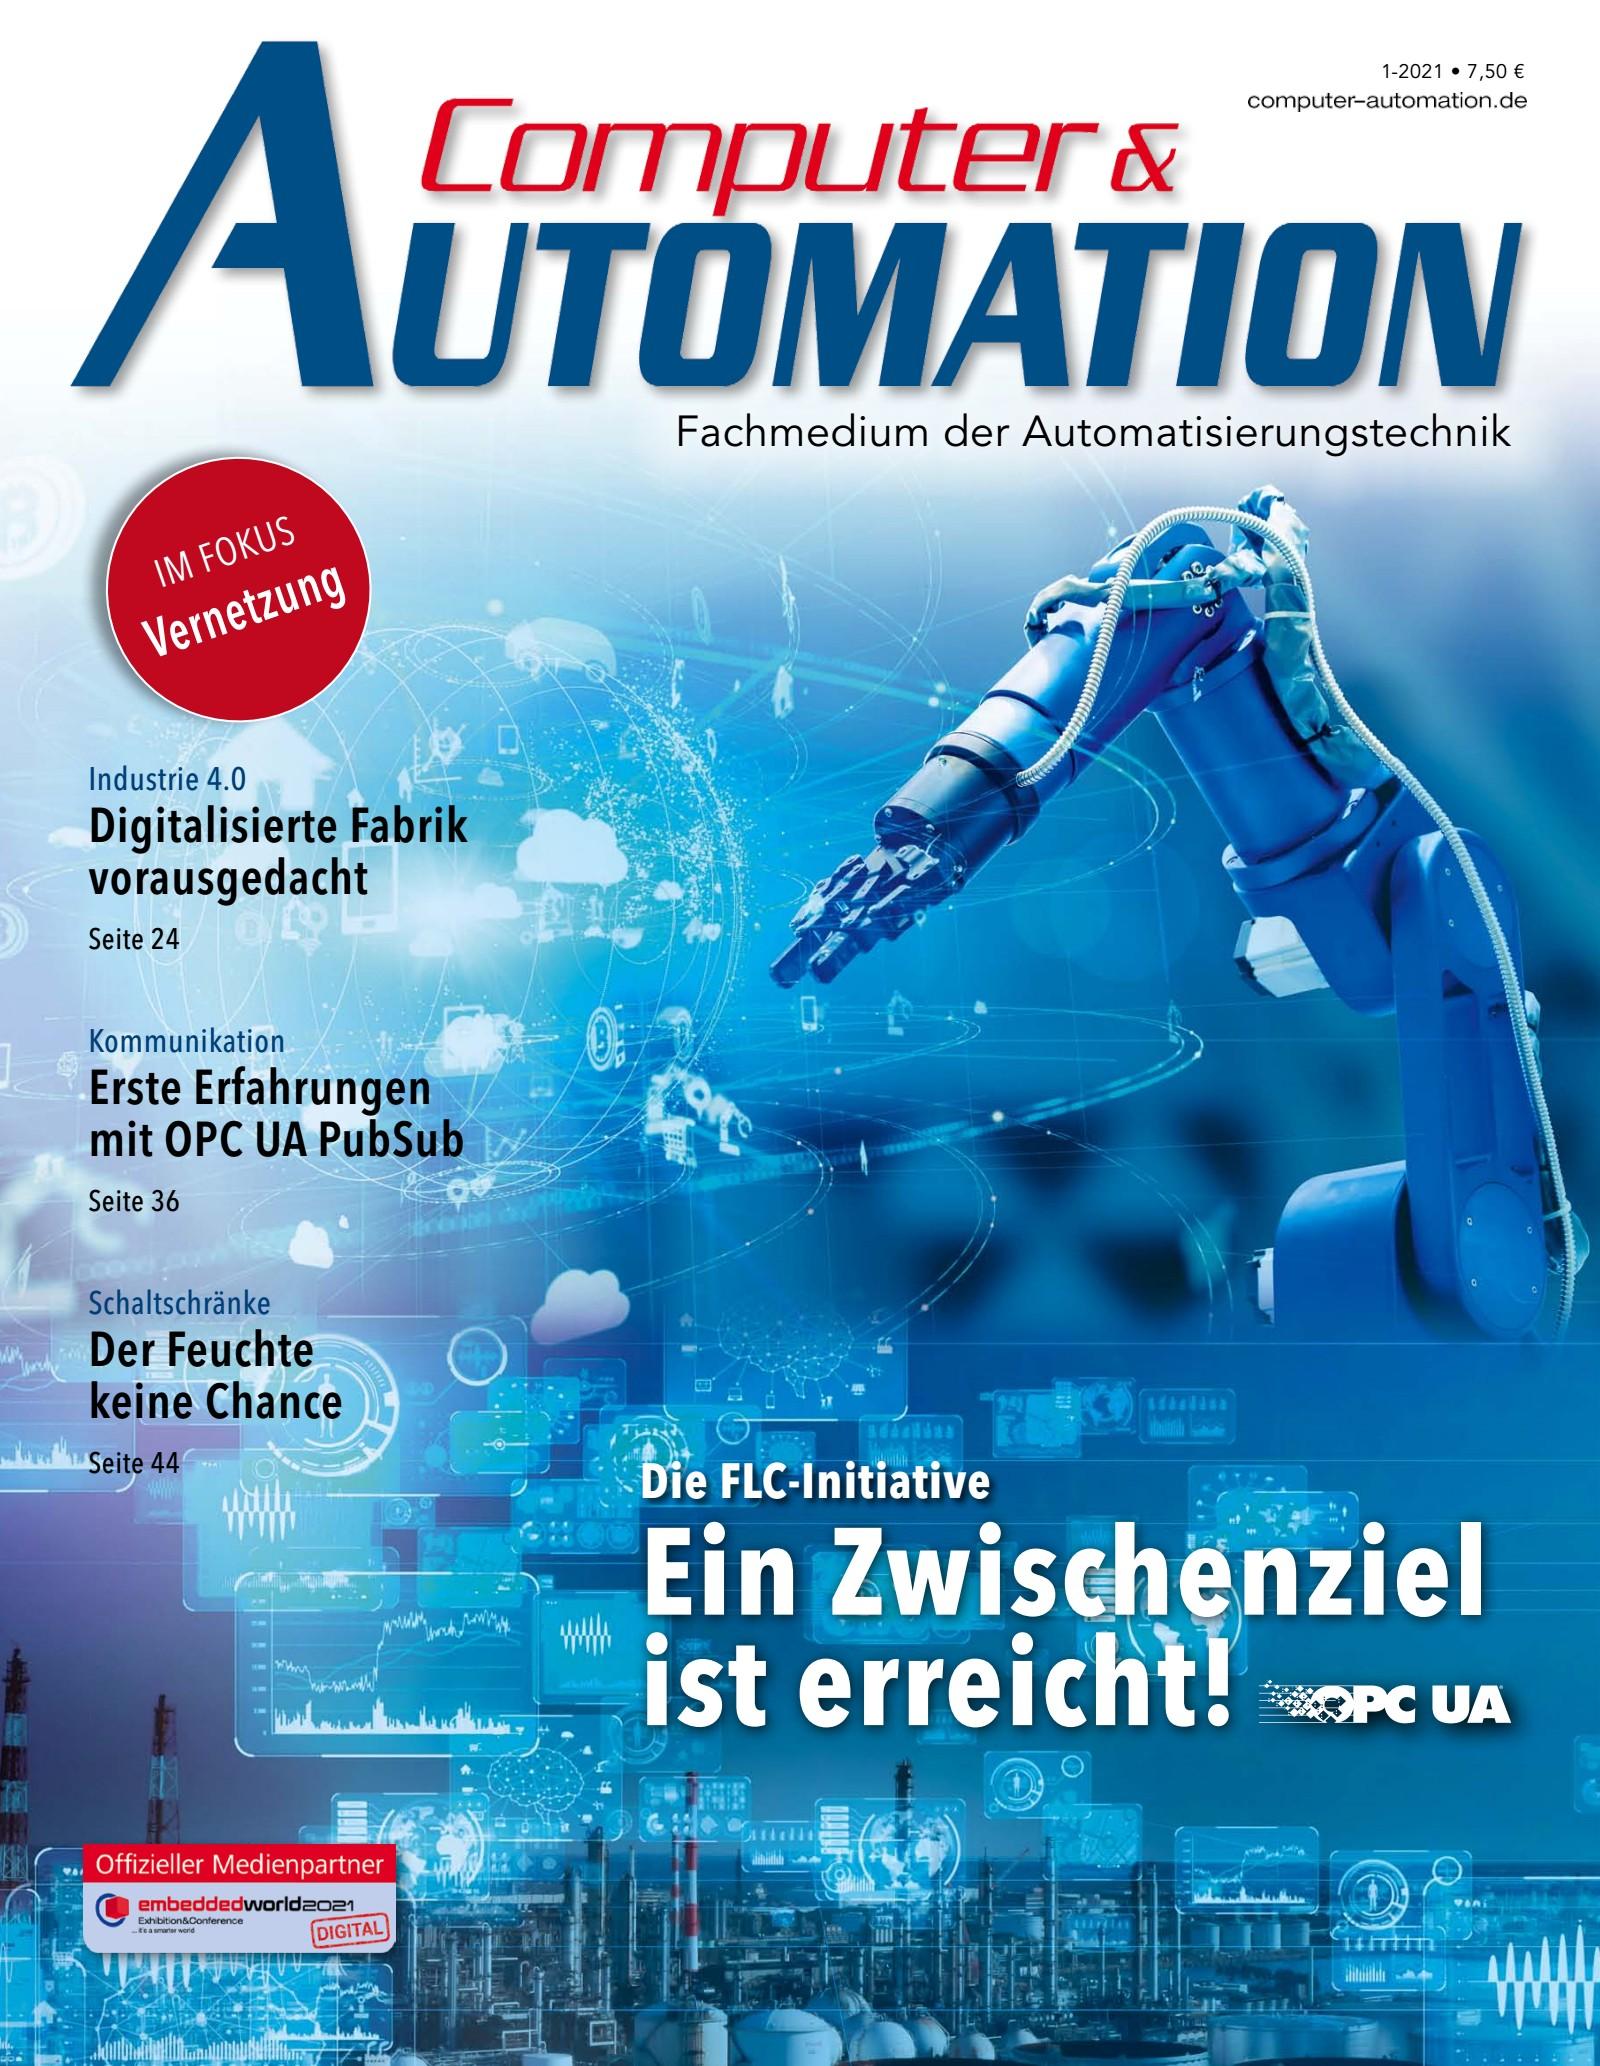 Computer&AUTOMATION 01/2021 Digital